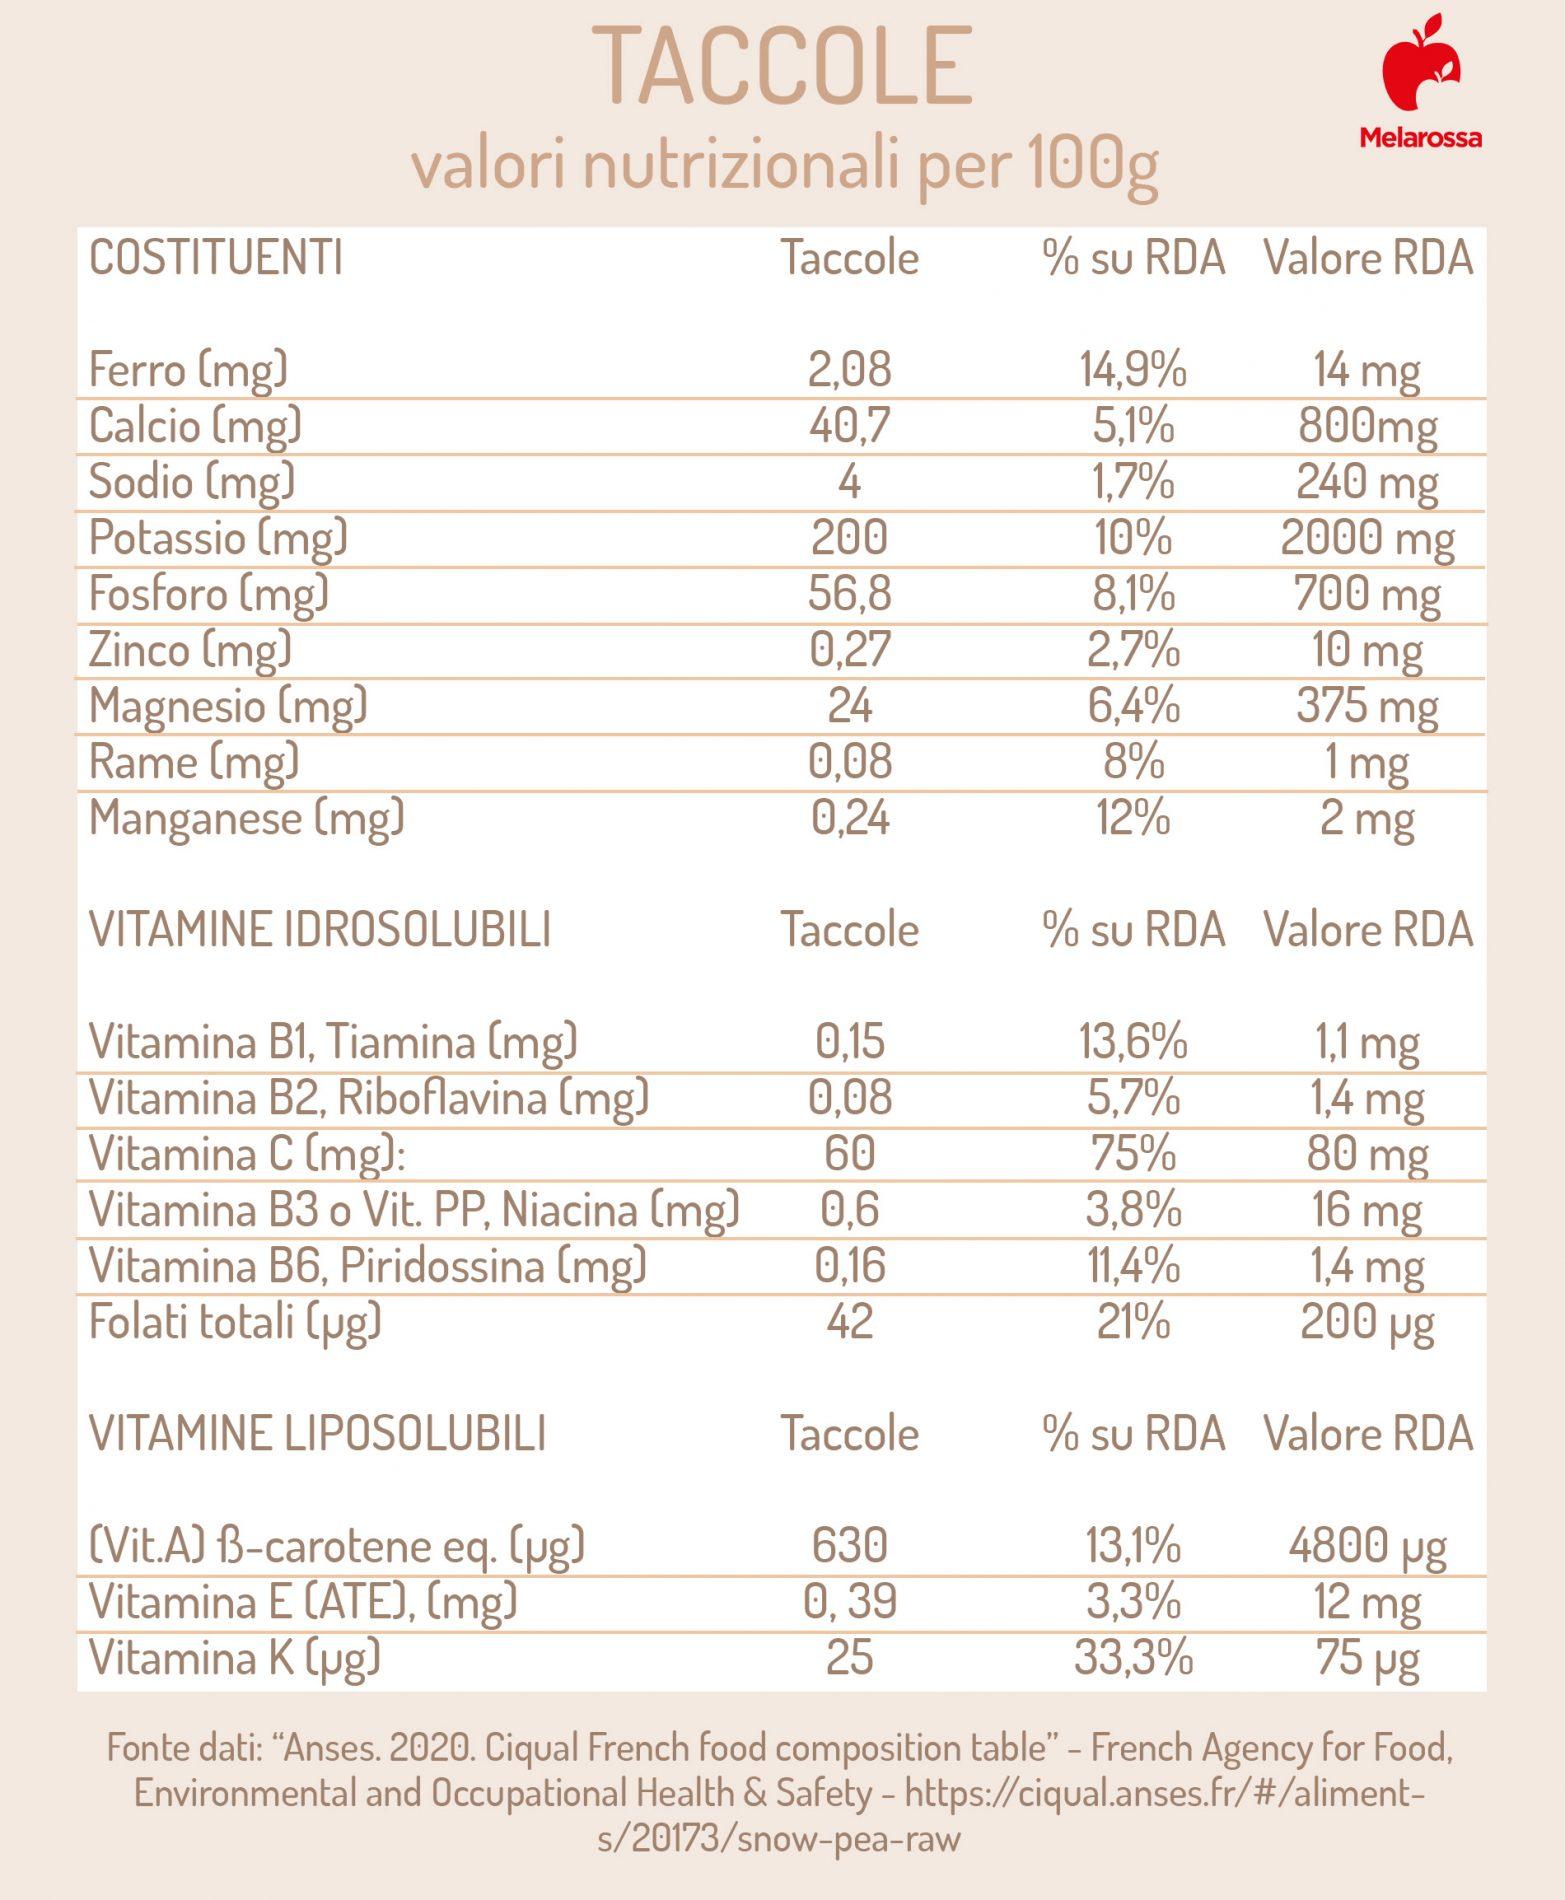 taccole: valori nutrizionali